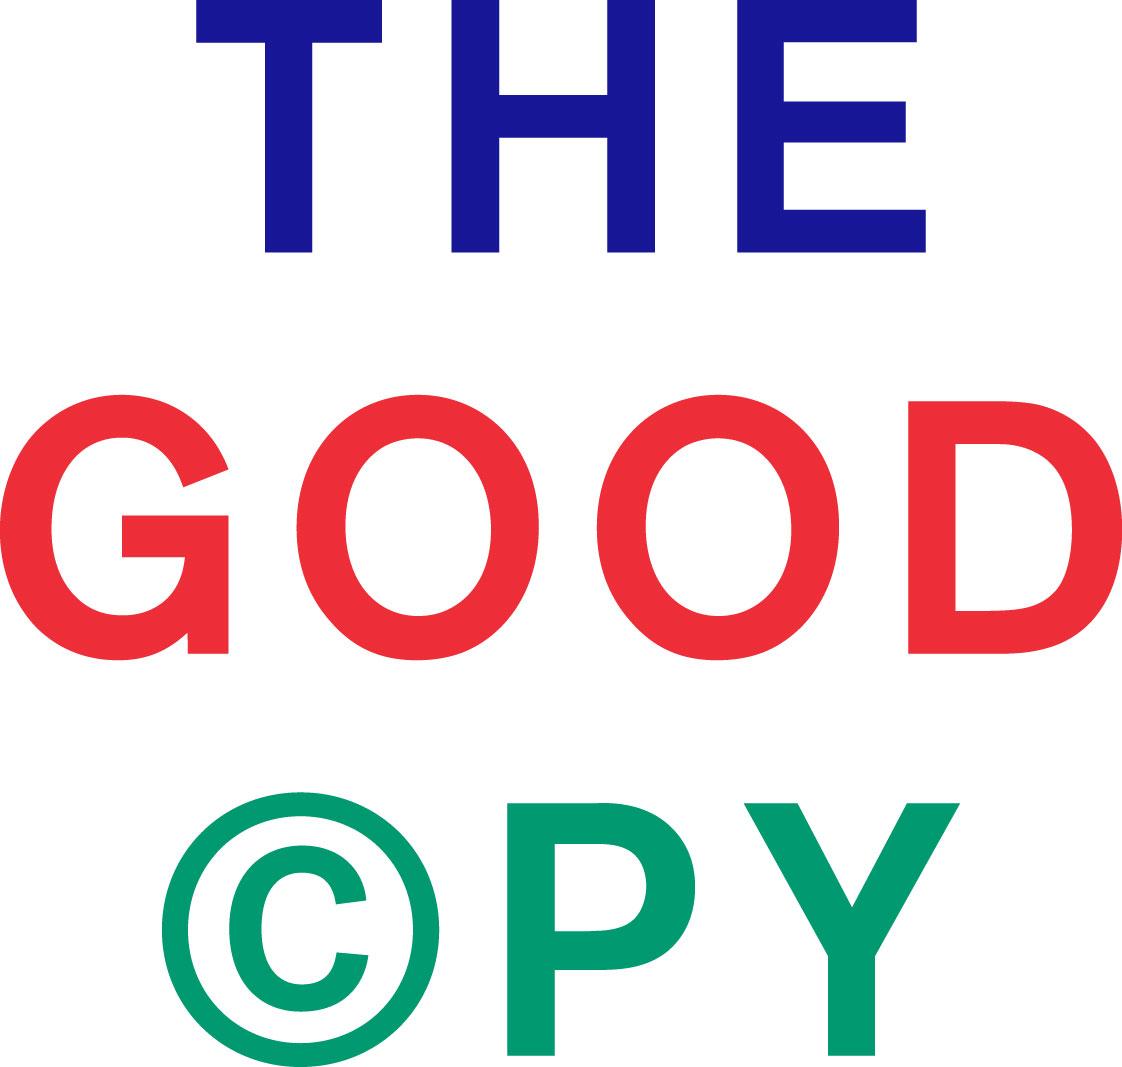 Thegoodcopy logo rgb